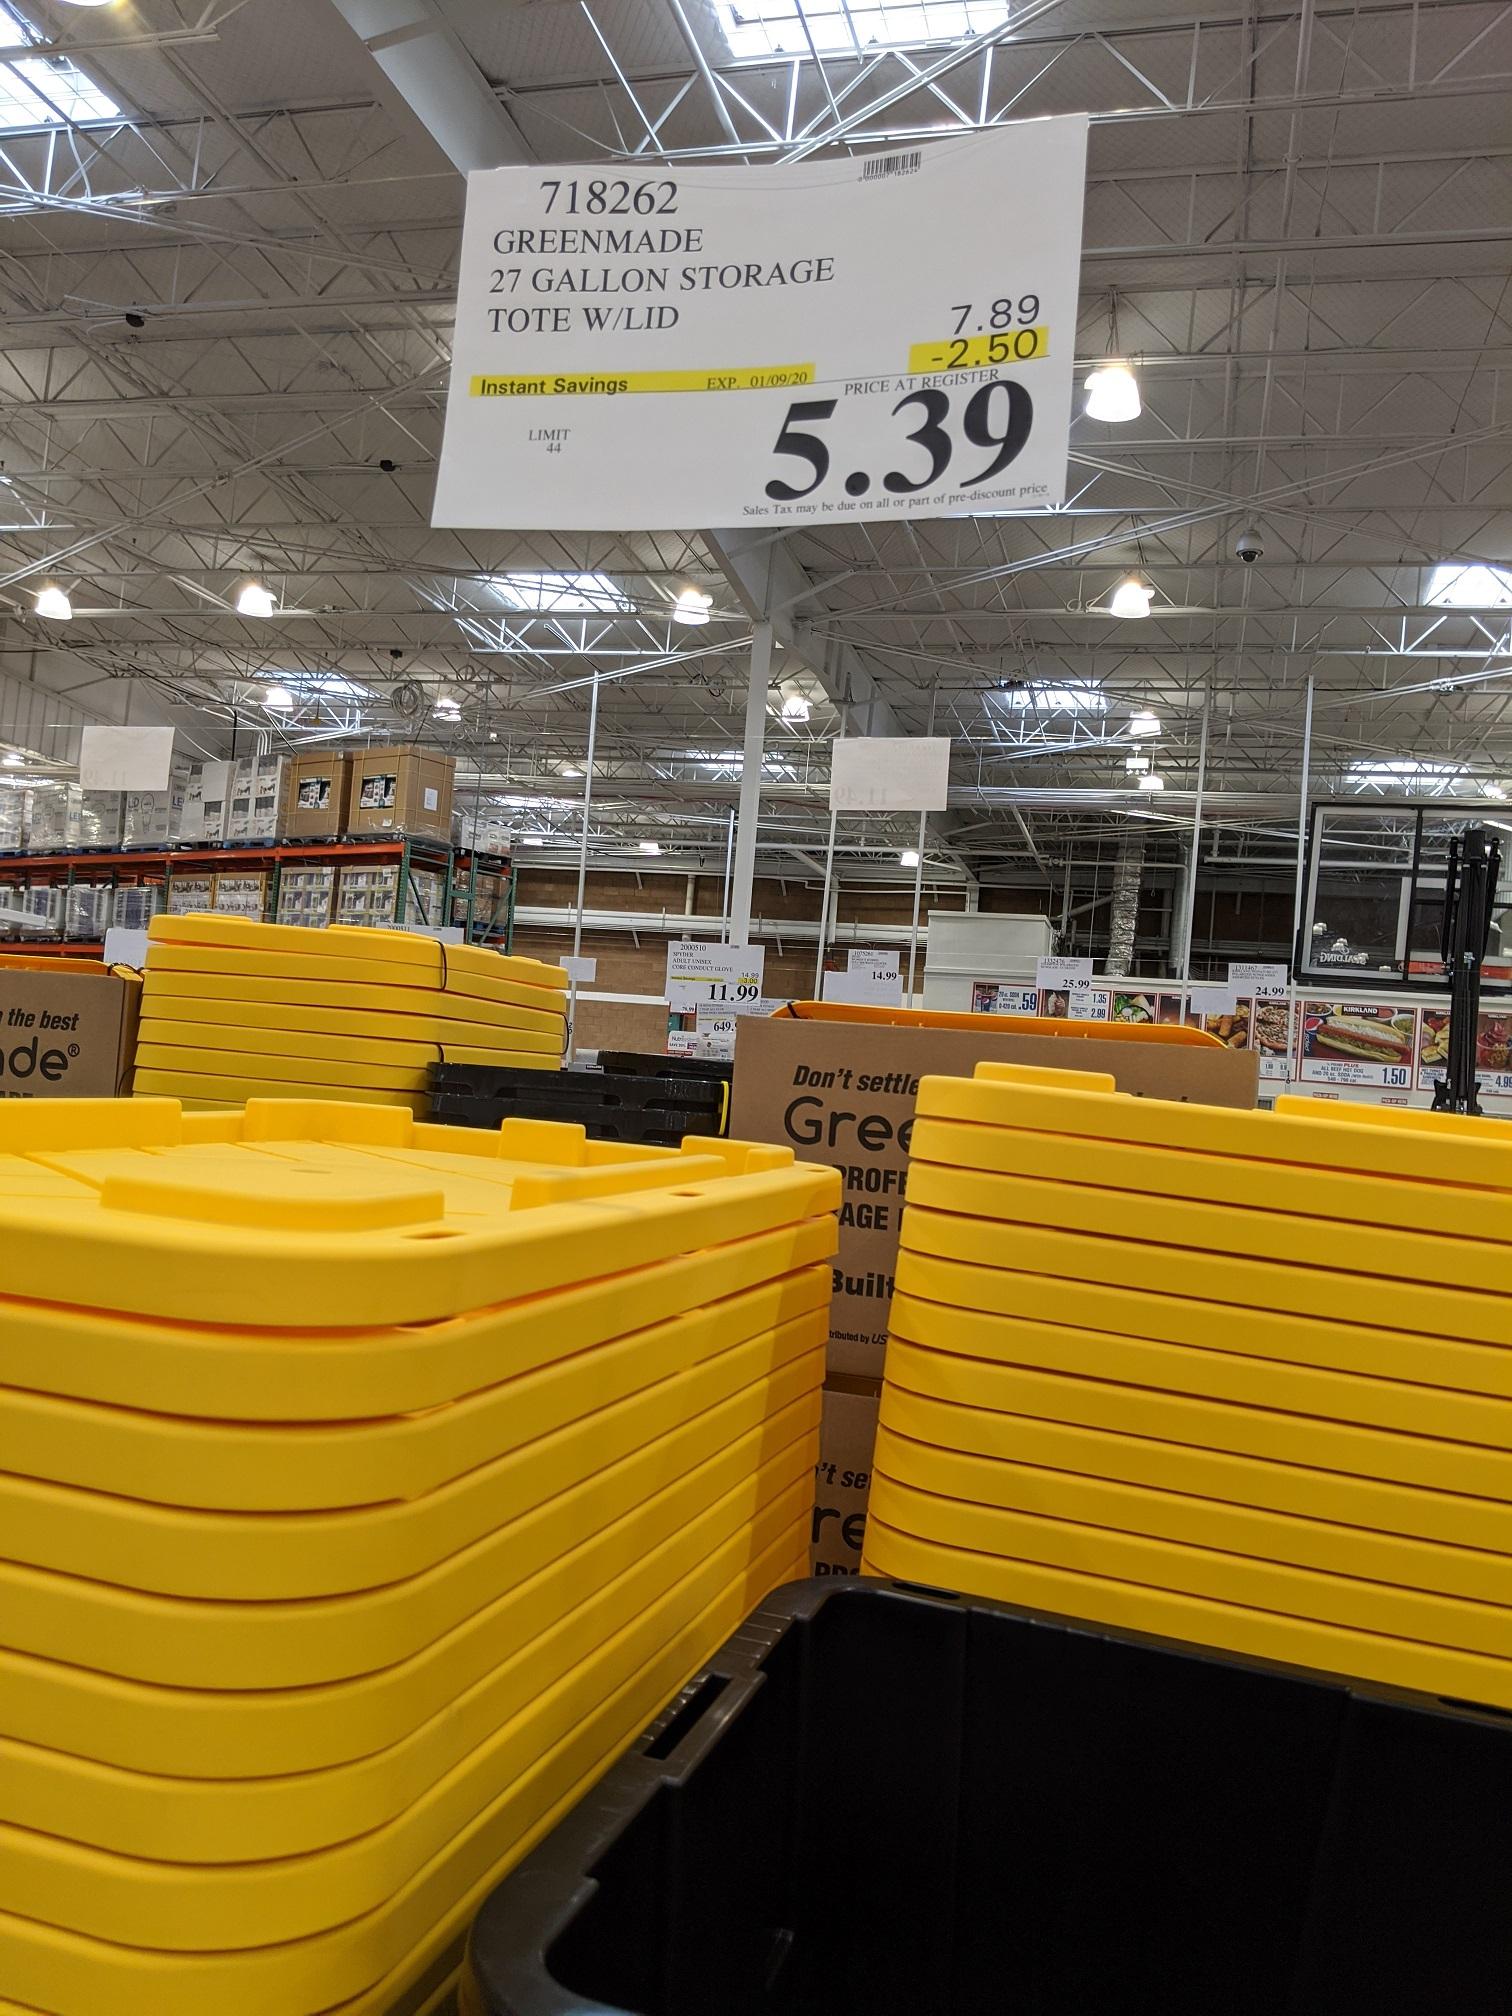 Greenmade 27 Gallon Storage Tote w/ Lid - $5.39 BnM Costco - YMMV based on location